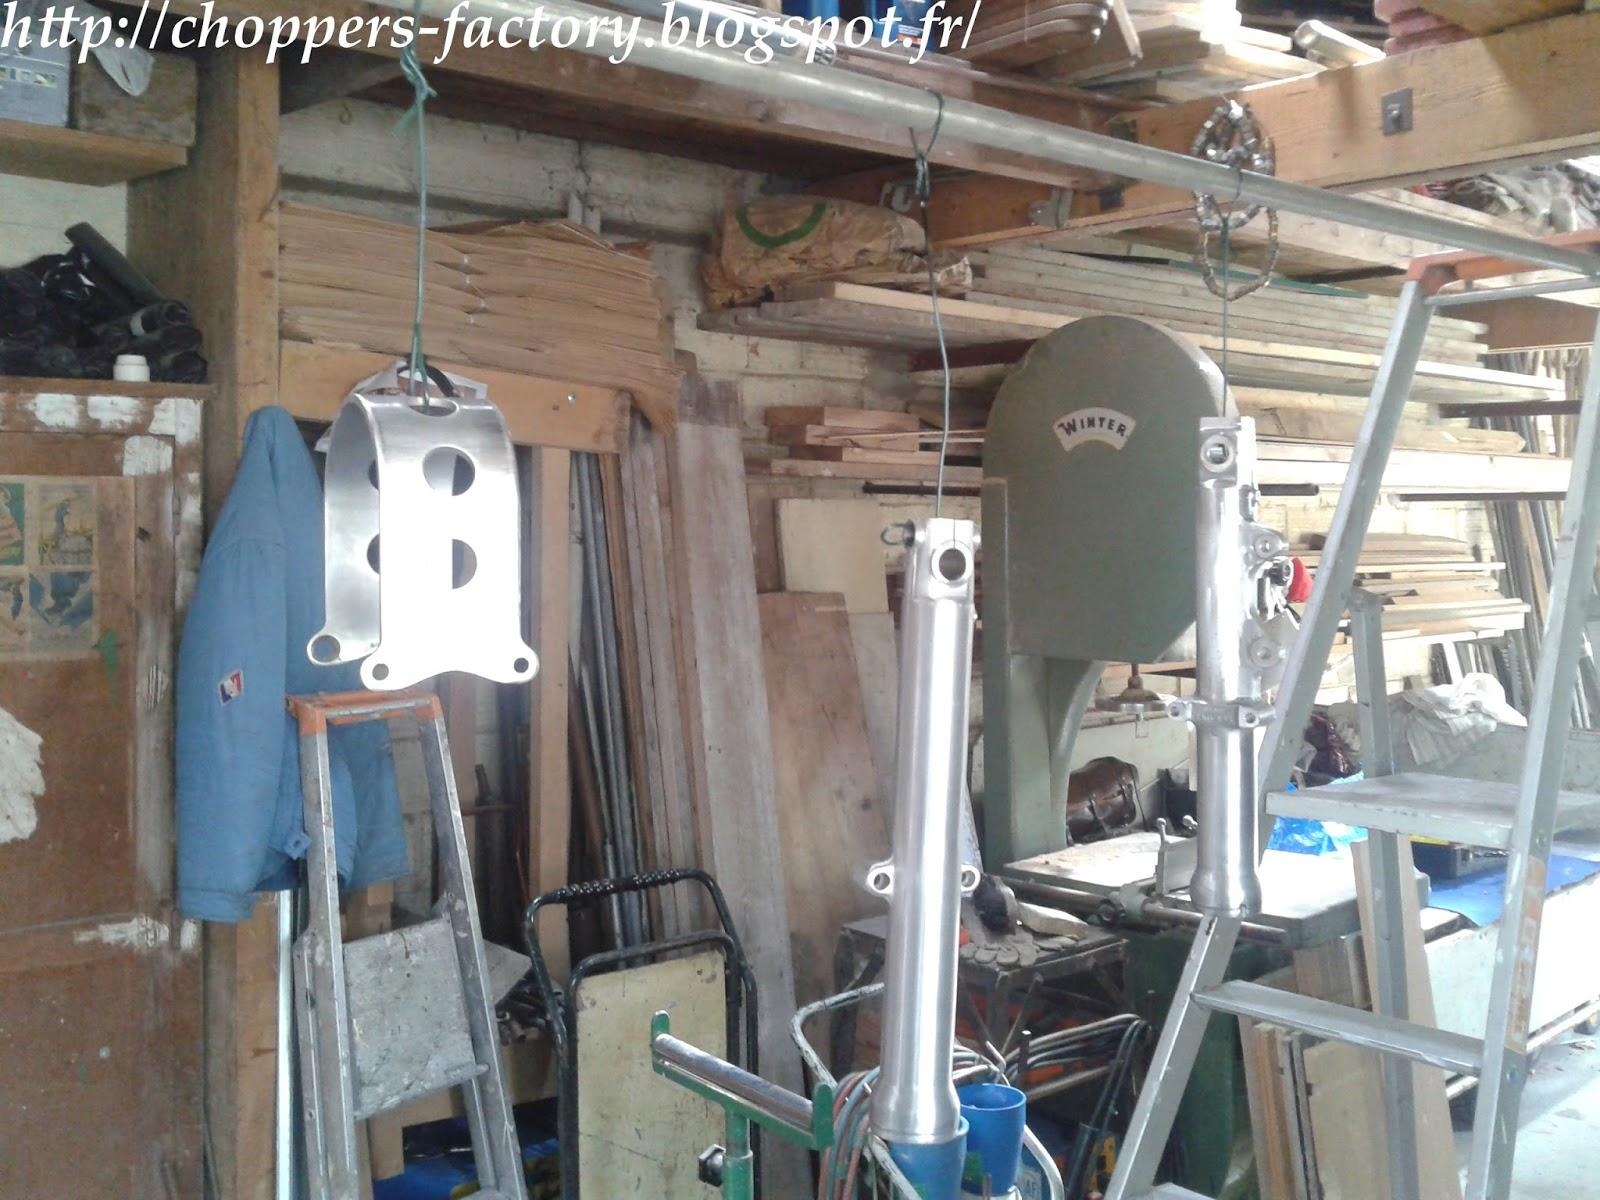 choppers factory sportster work peinture epoxy fourche. Black Bedroom Furniture Sets. Home Design Ideas